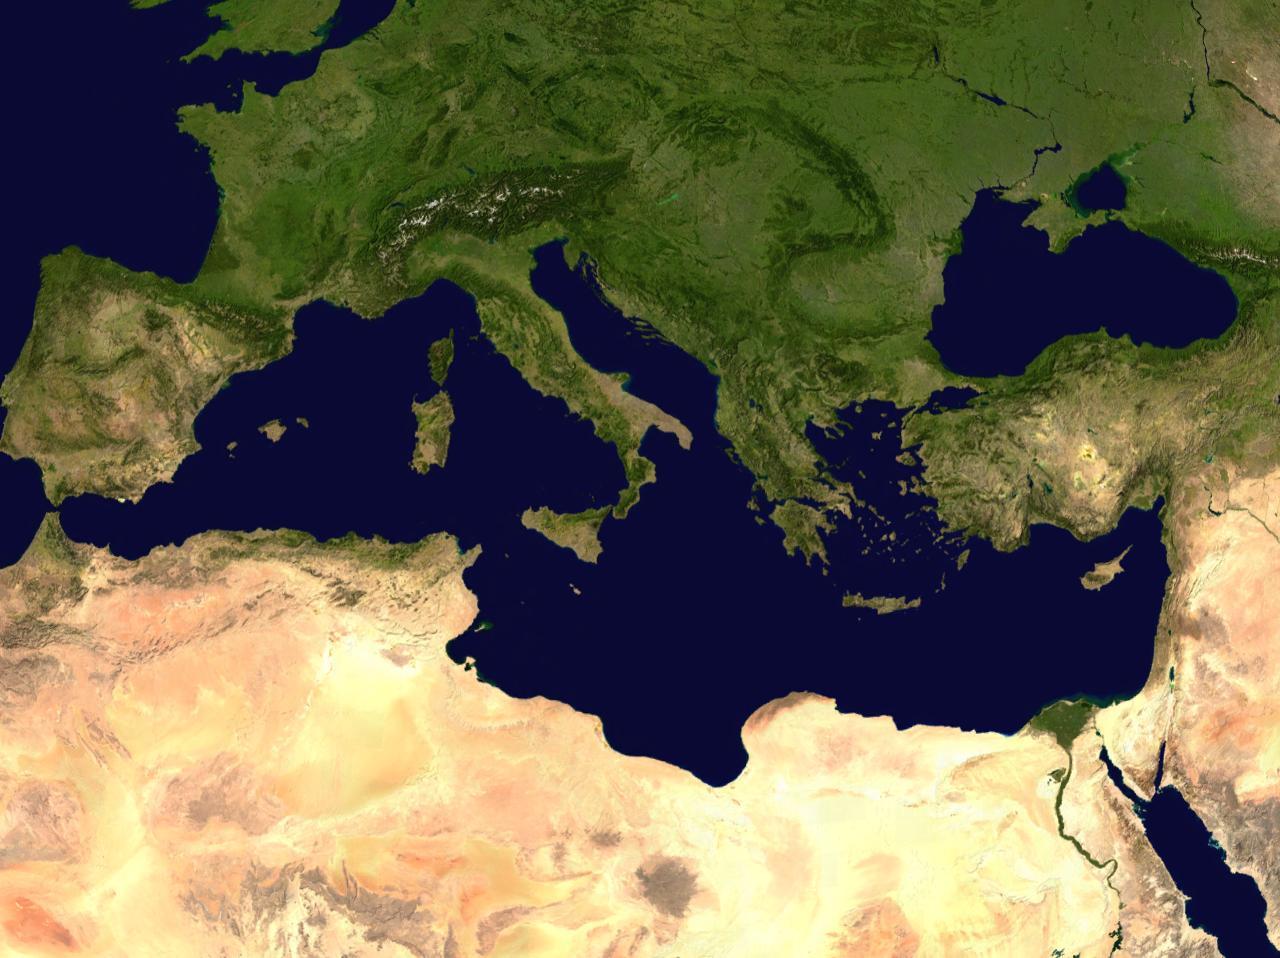 Satellite view of the Mediterranean